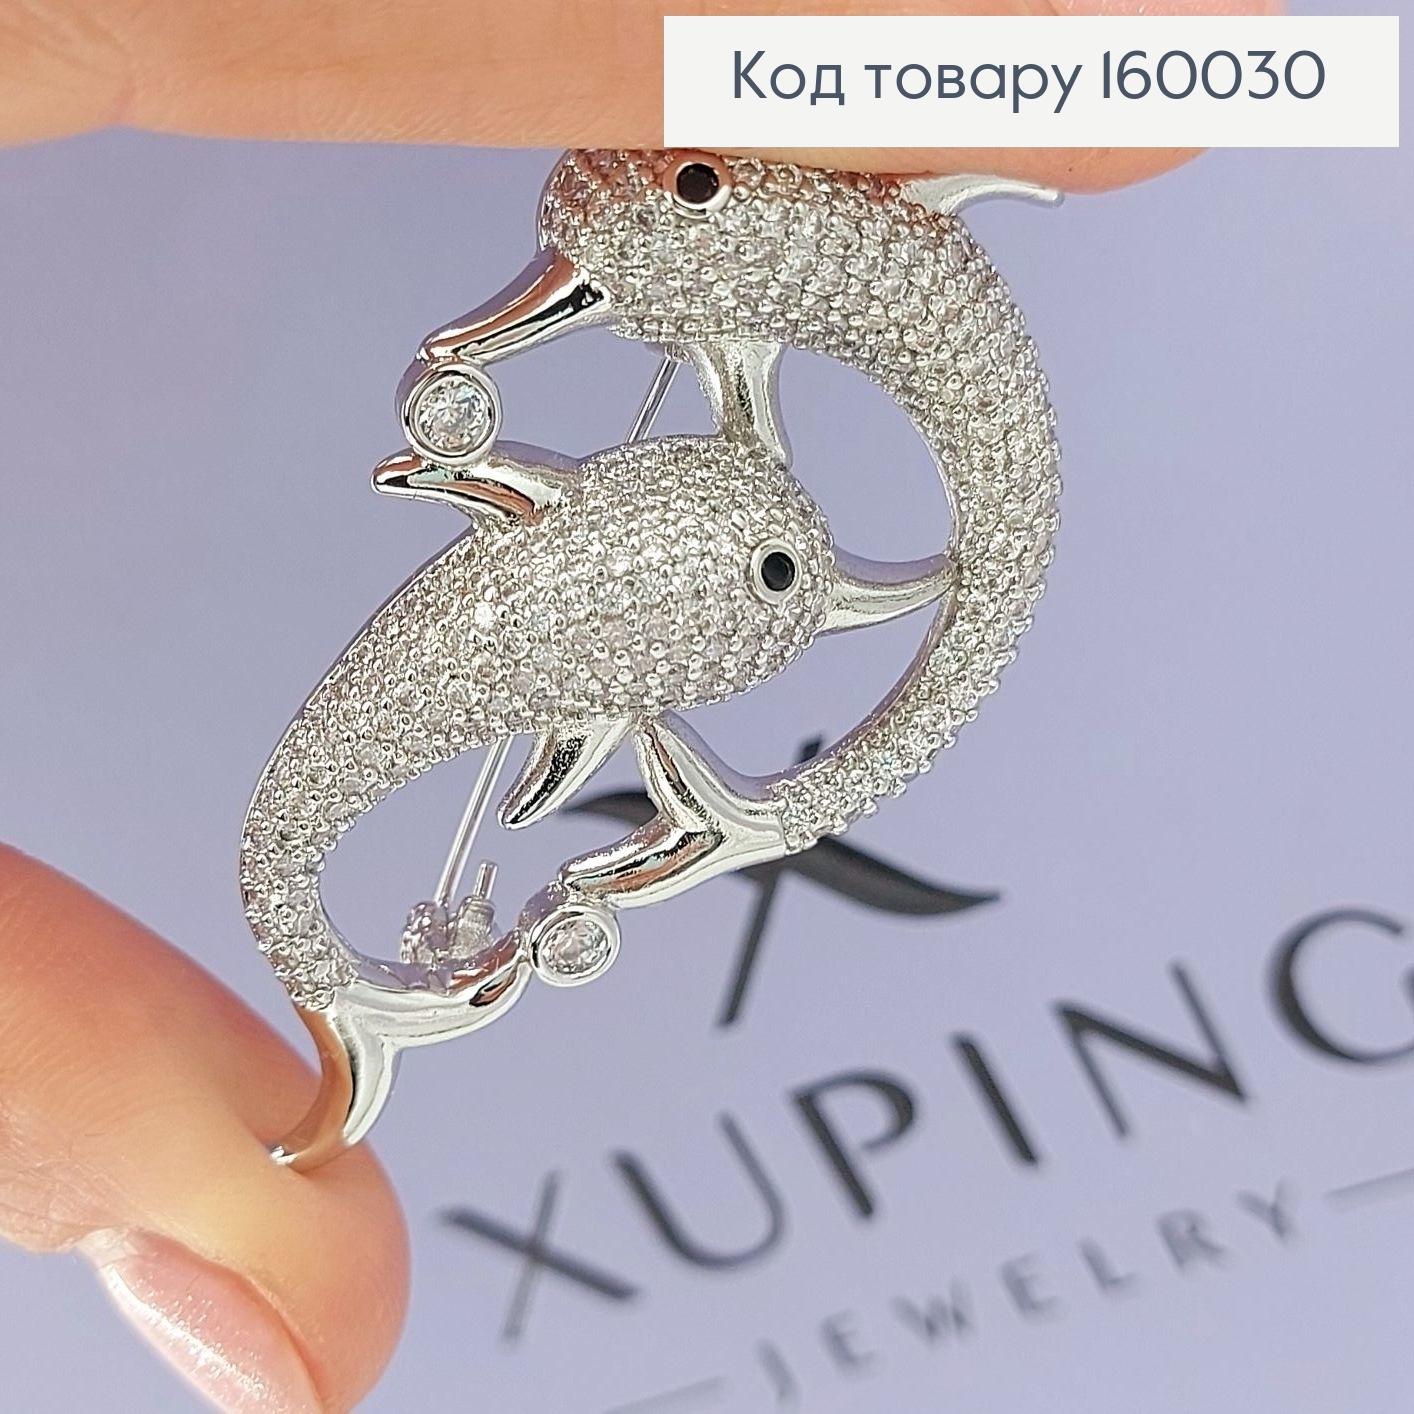 Брошка Дельфіни   в камінцях медичне золото  Xuping 18к 160030 фото 1